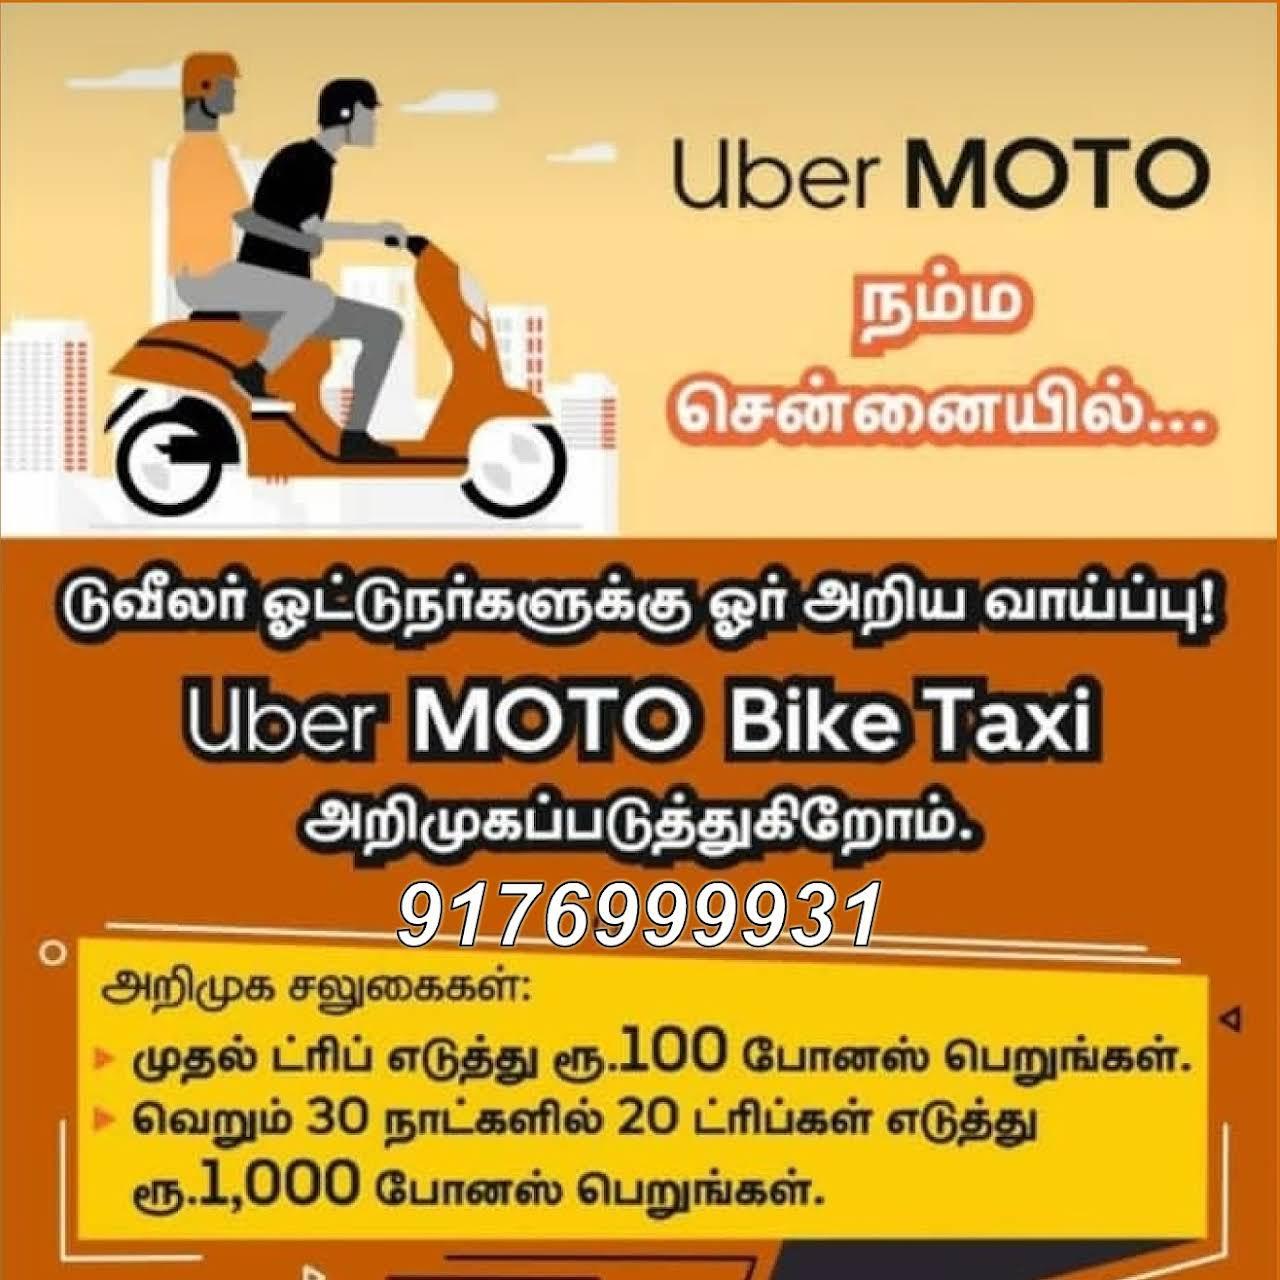 Uber Attachment Office Uber Auto Cab Attachment Office